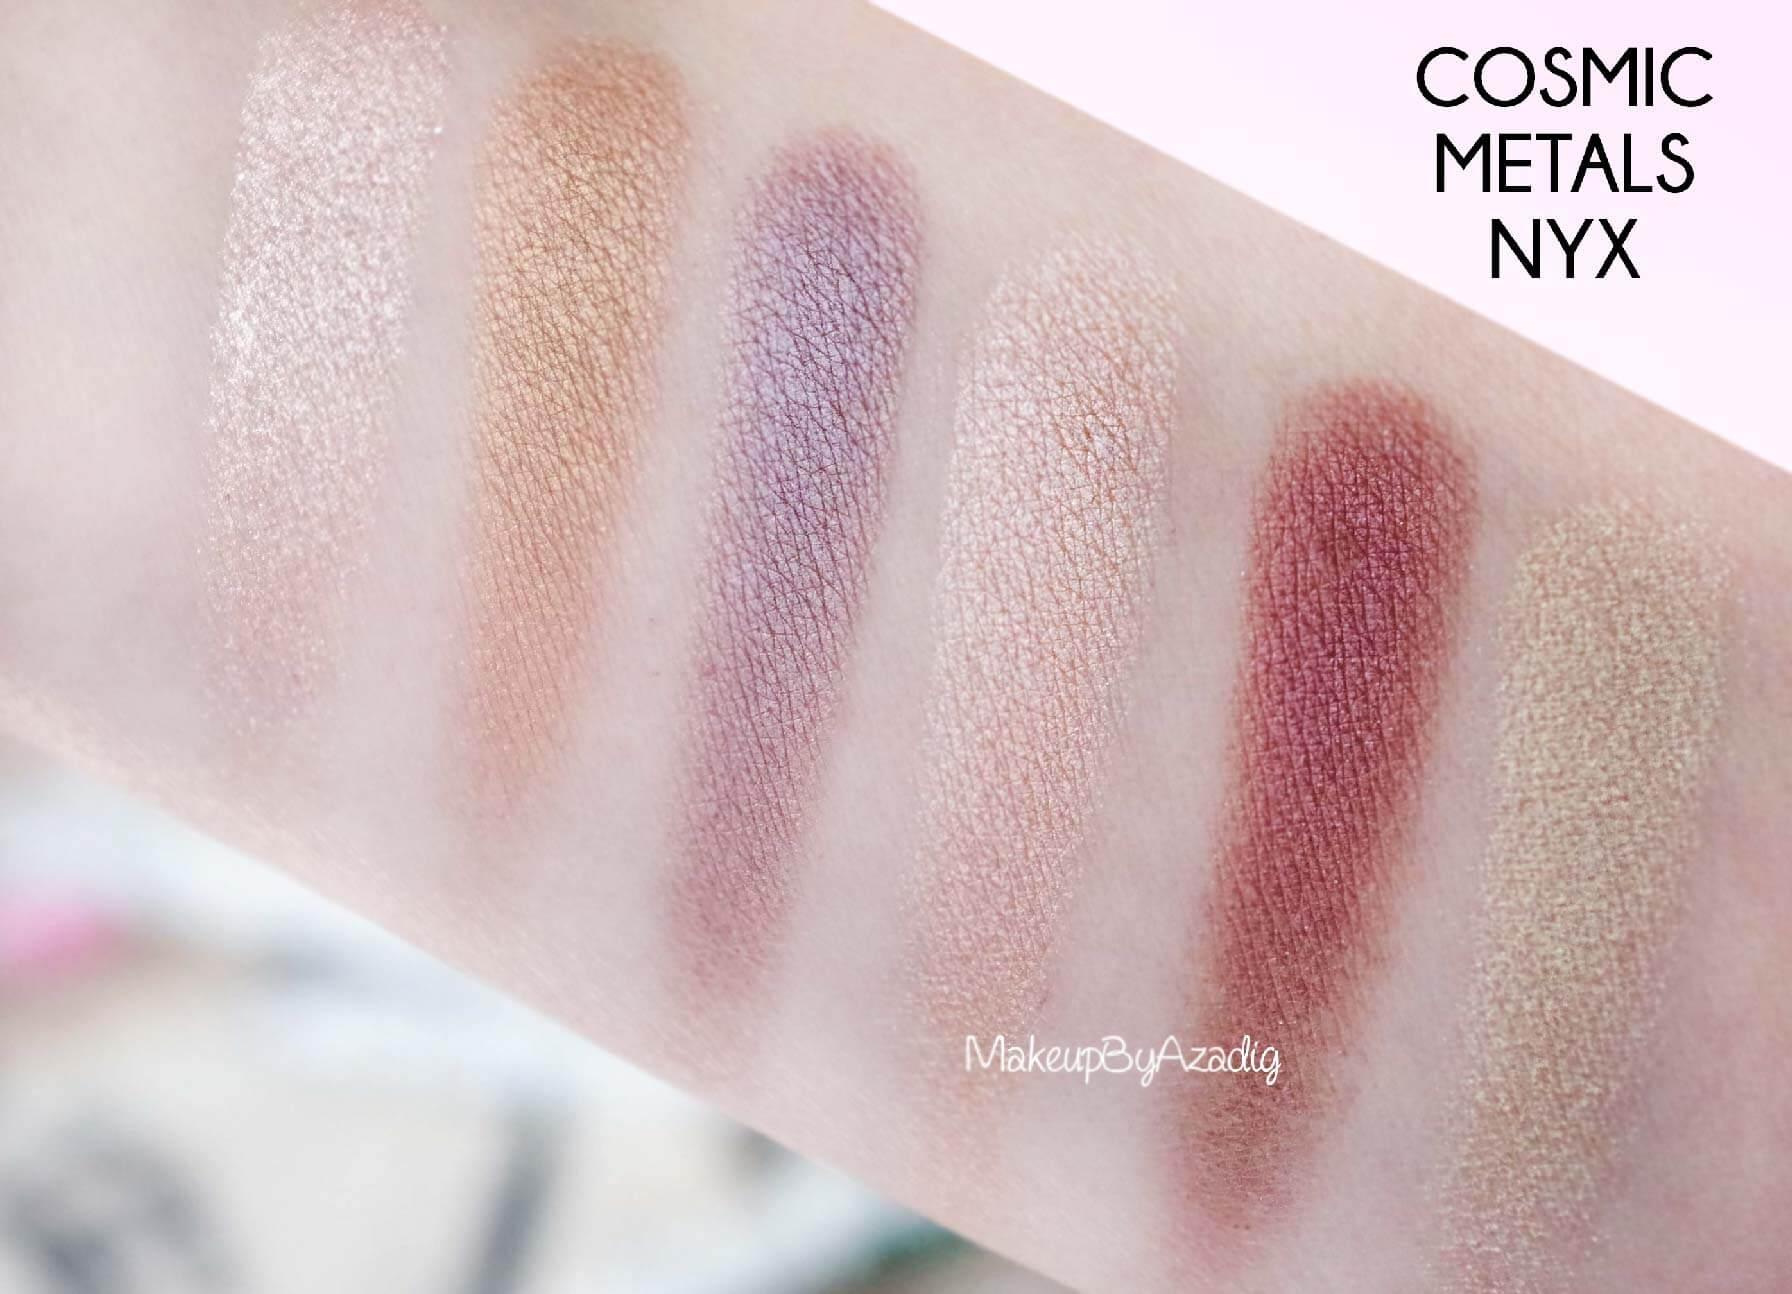 revue-palette-fards-paupieres-cosmic-metals-nyx-cosmetics-pas-cher-meilleure-makeupbyazadig-influencer-swatch